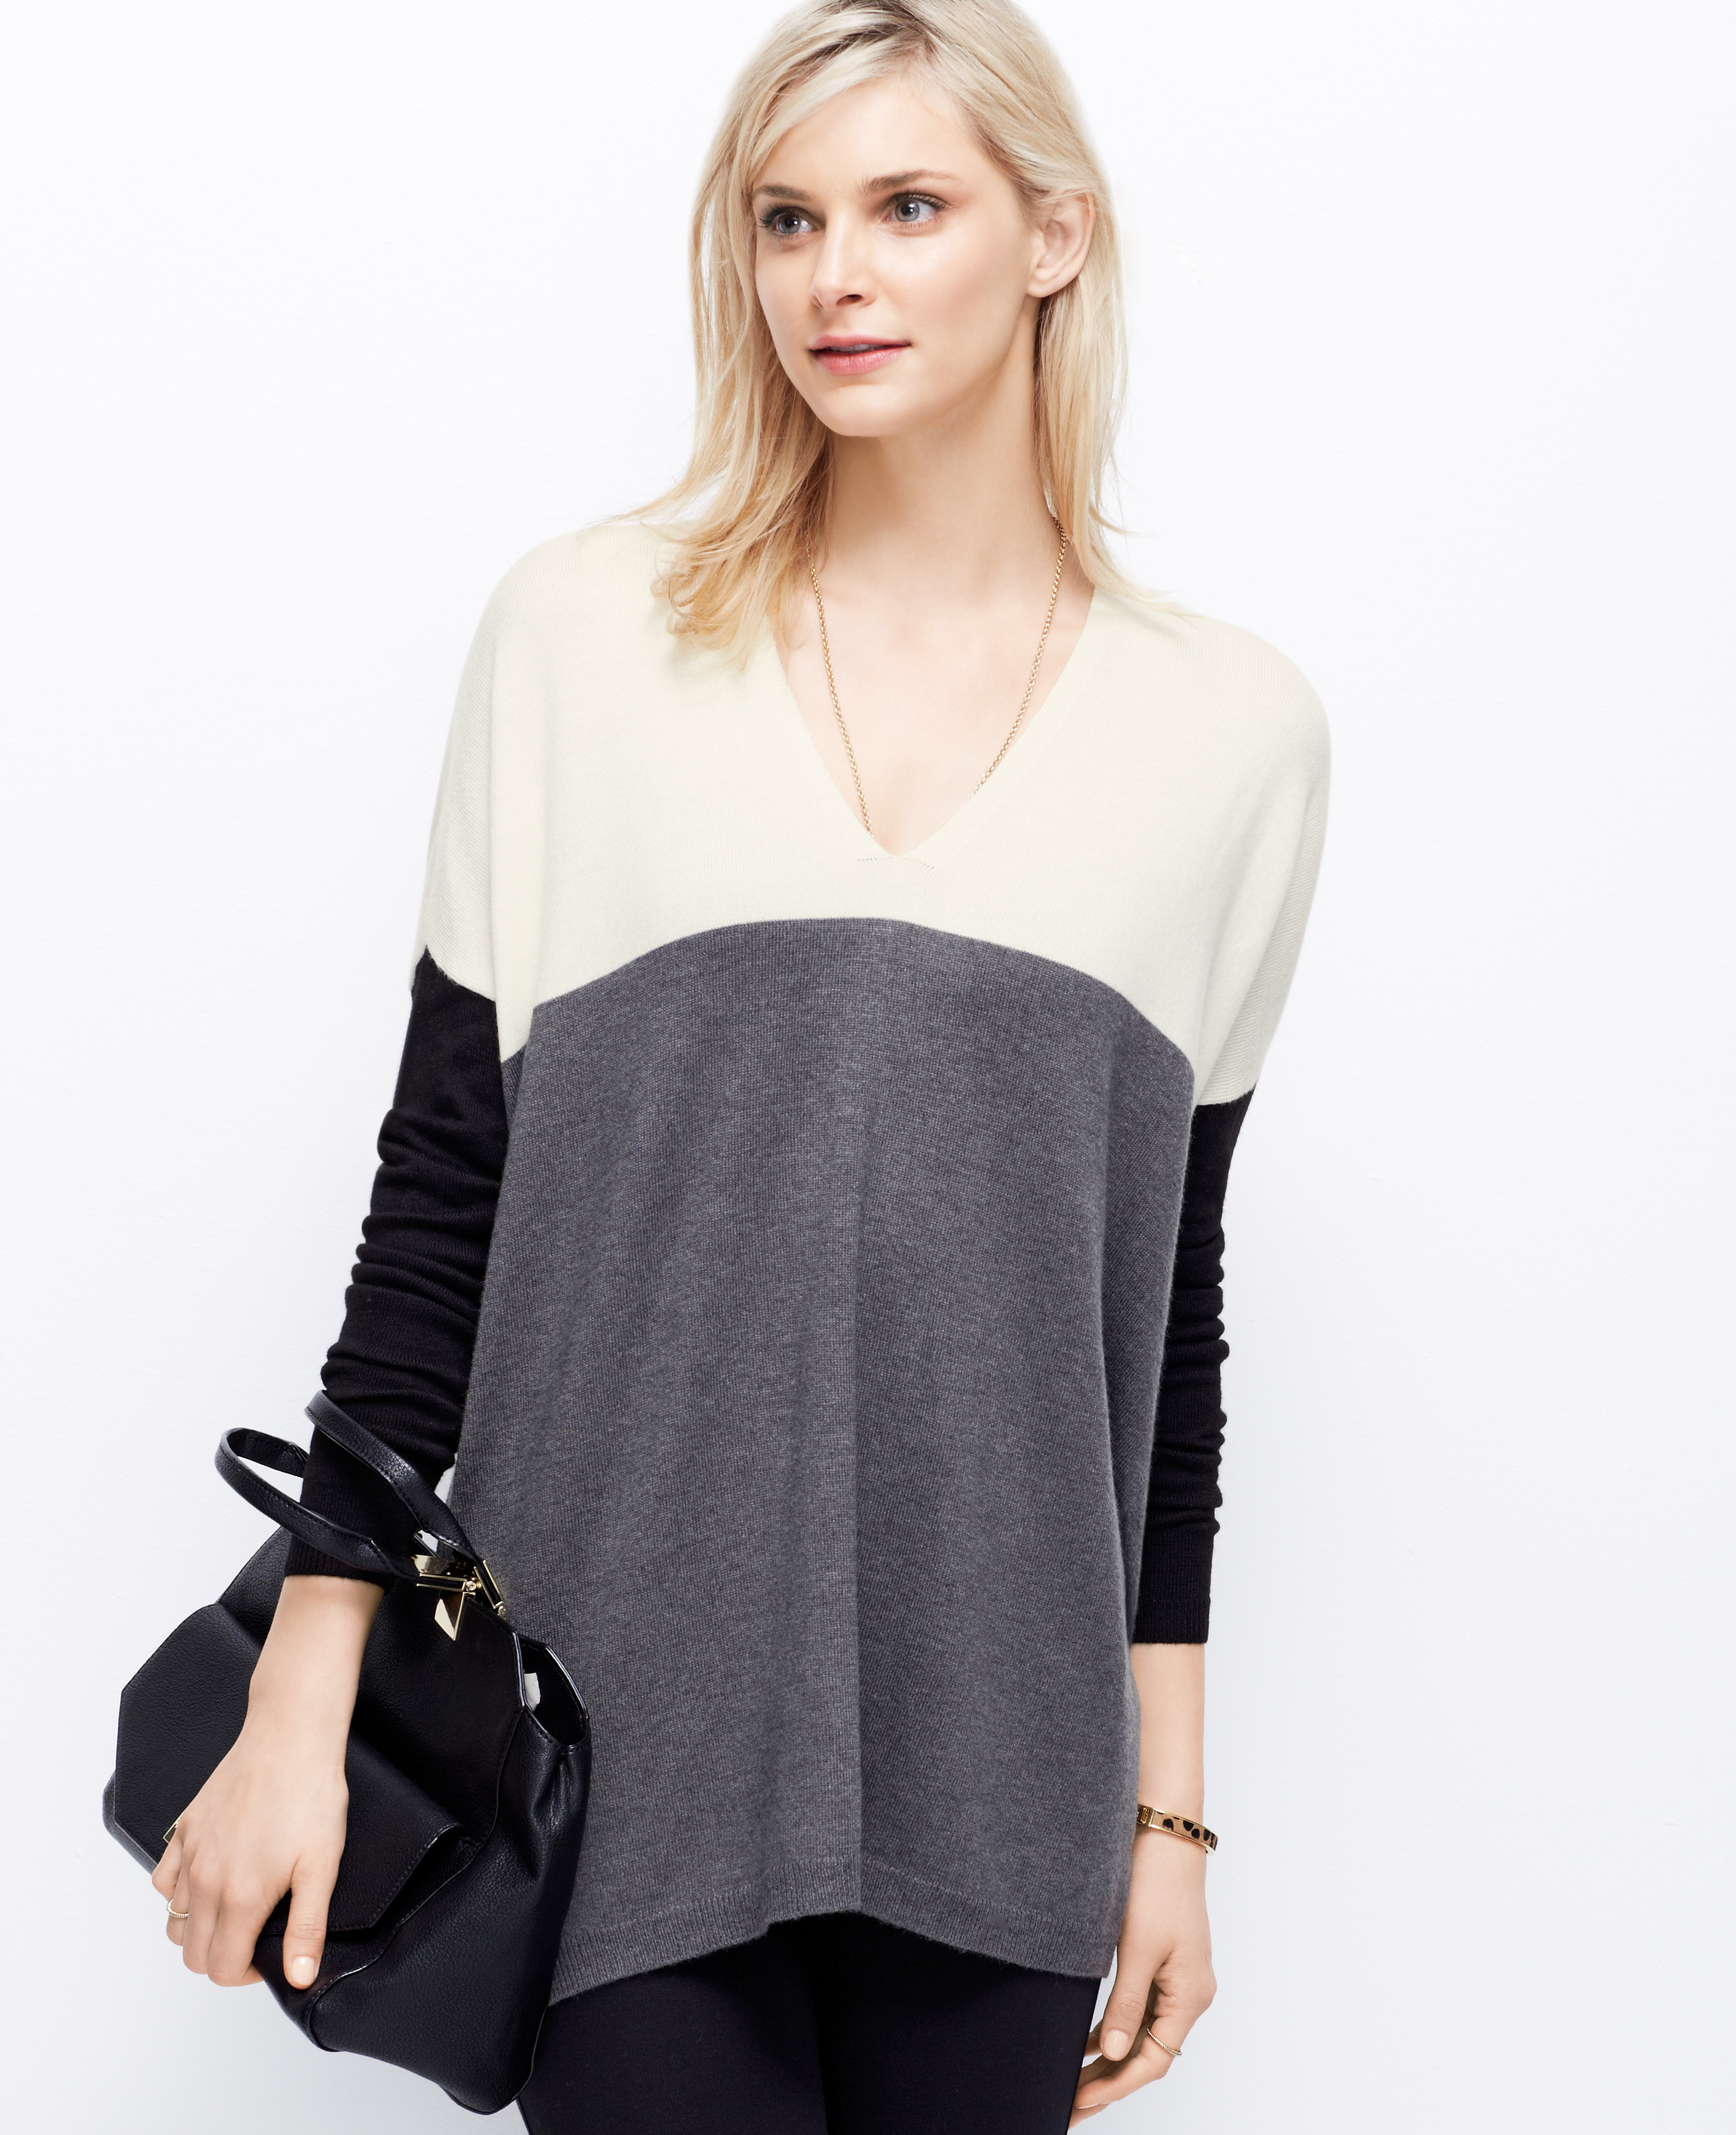 Ann taylor Petite Colorblock V-neck Tunic Sweater in Metallic | Lyst